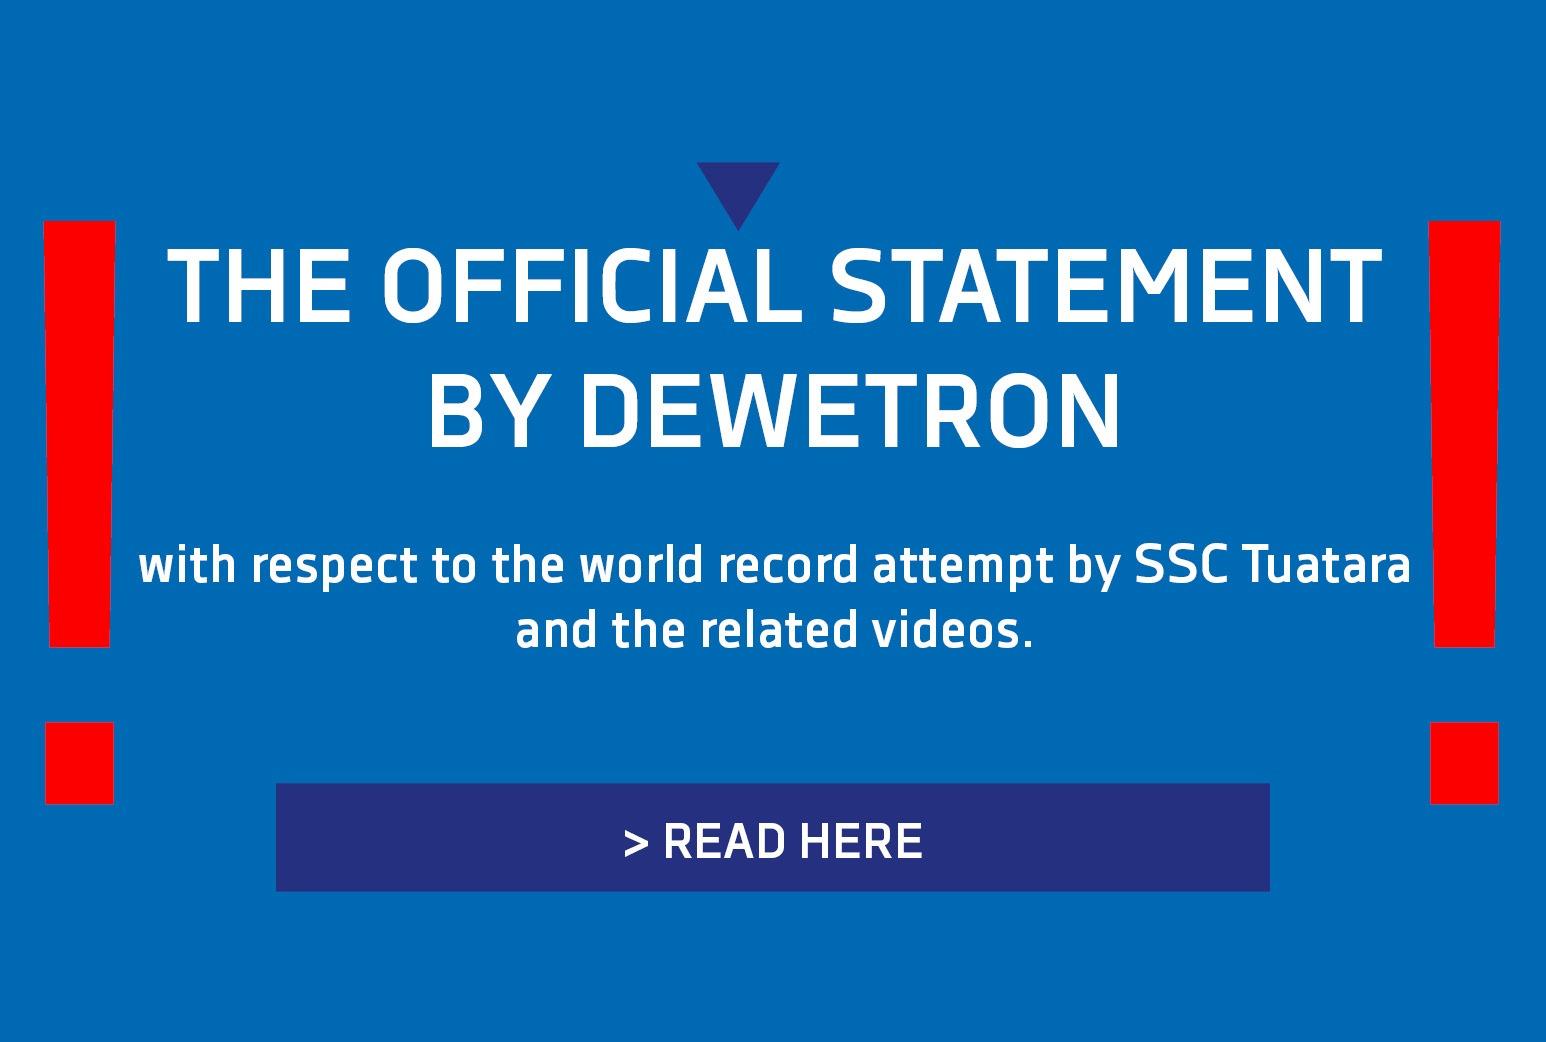 Press release DEWETRON SSC Tuatara world record attempt